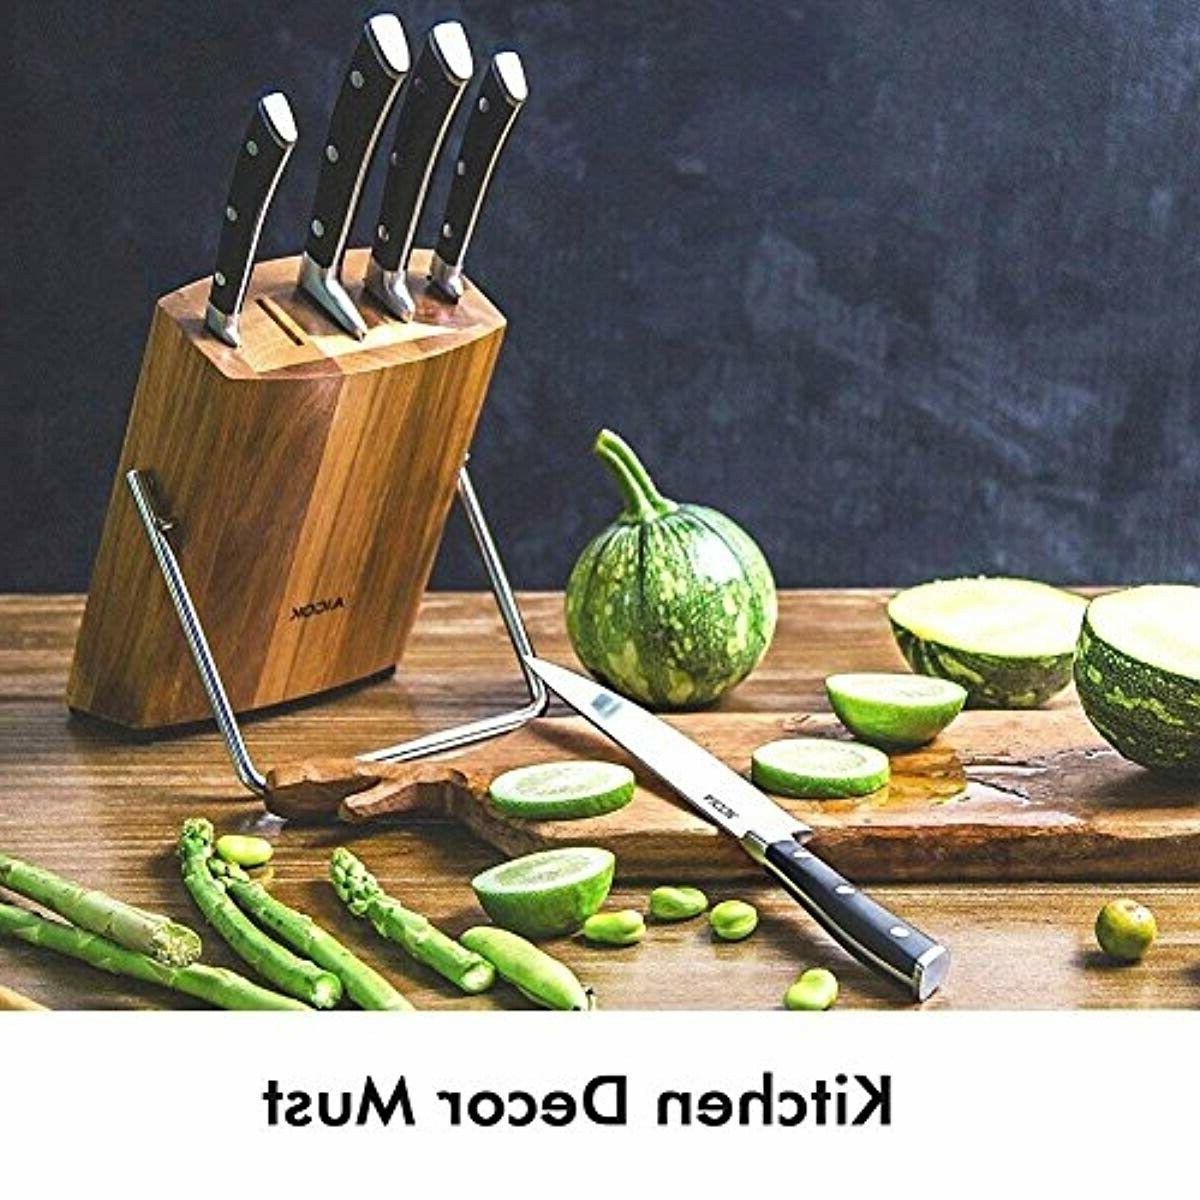 Kitchen Set, Wooden Block Germany